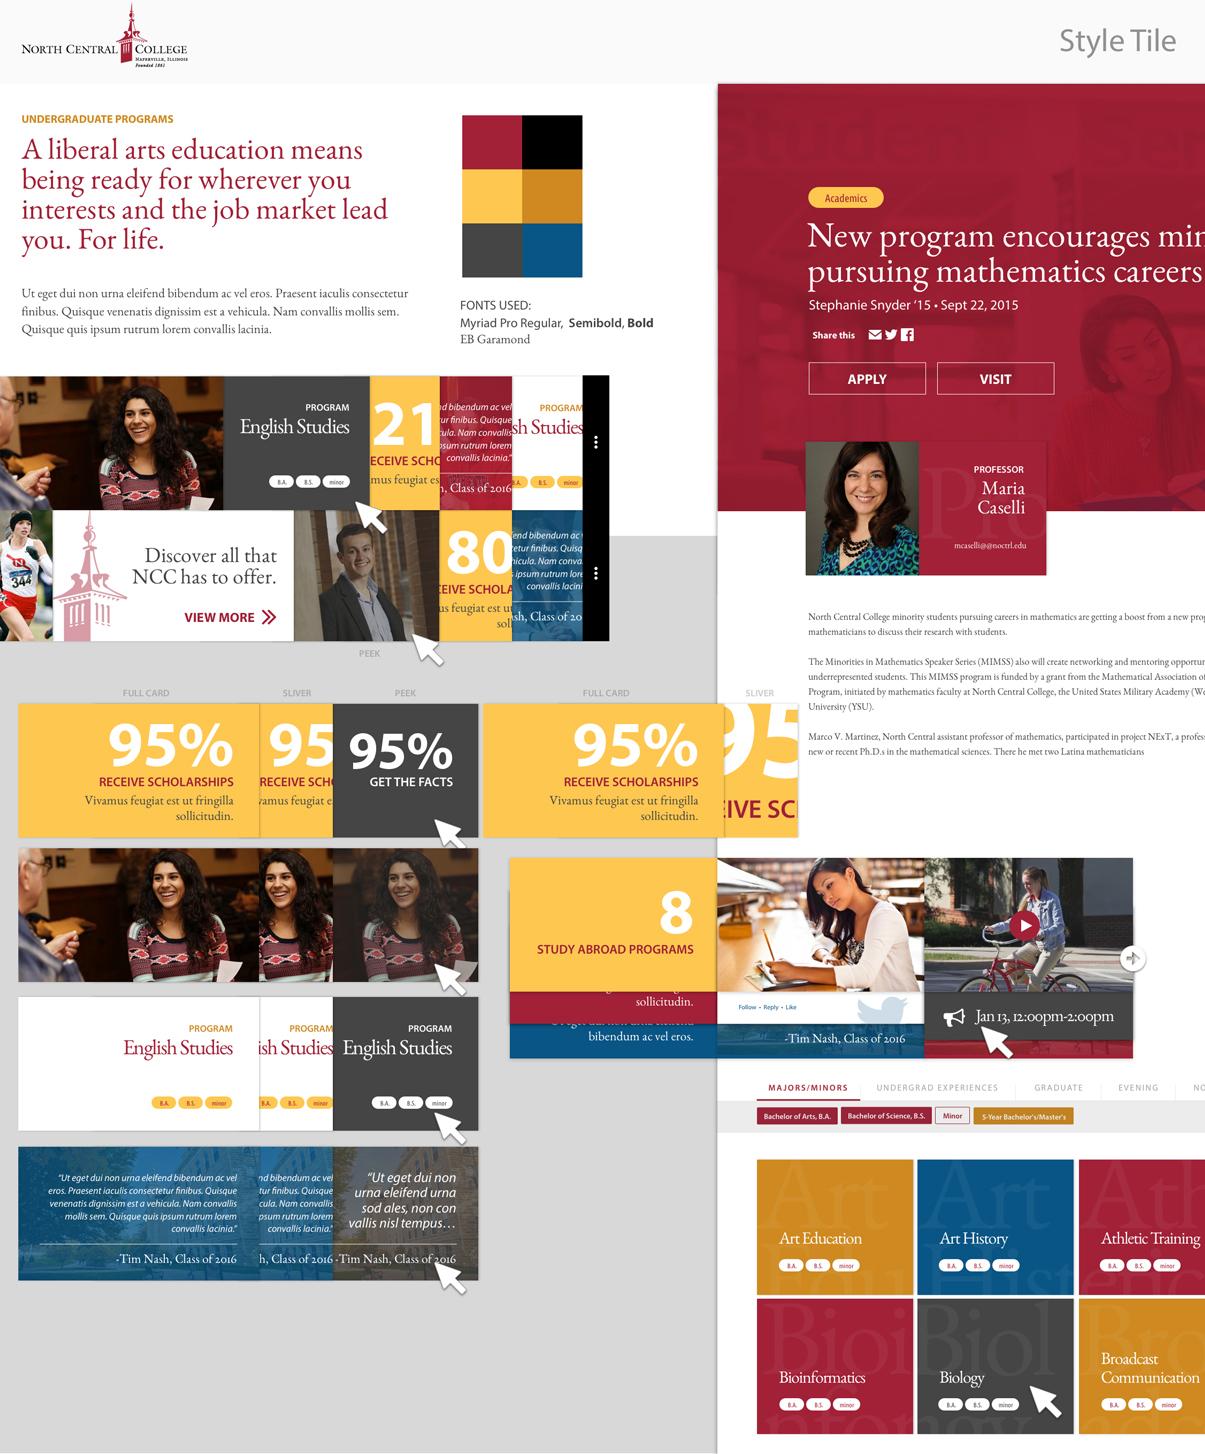 Website Style Tile Concept